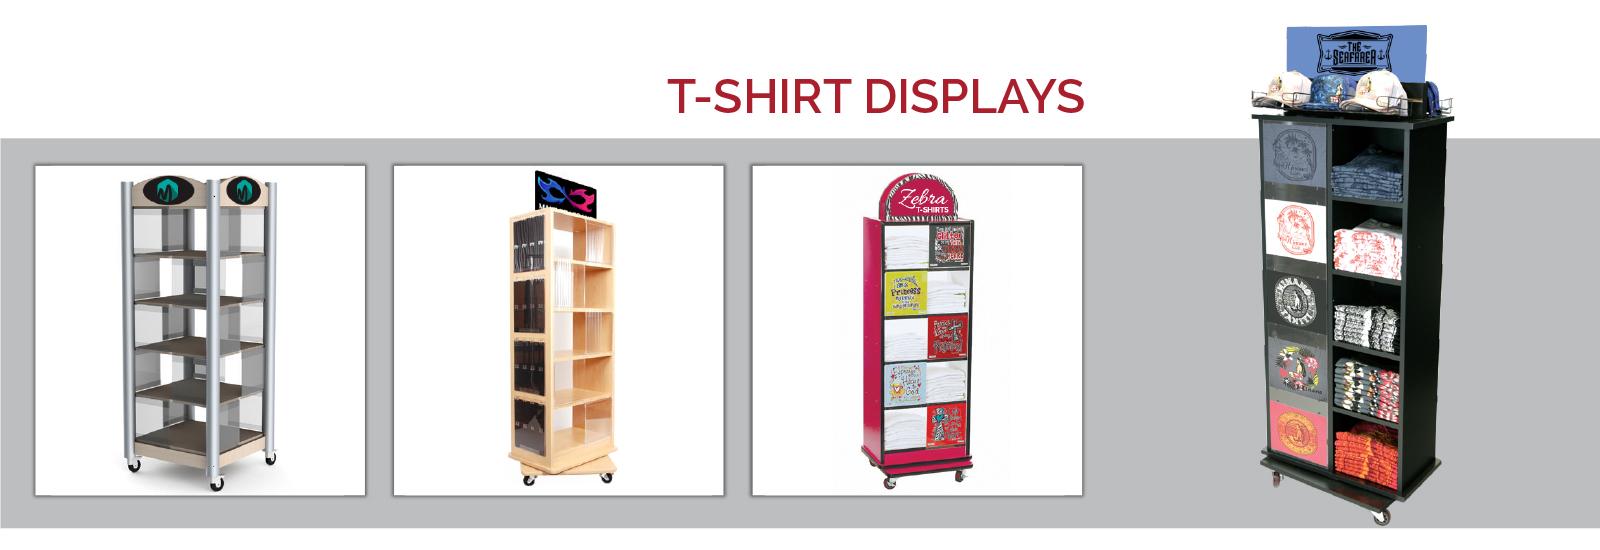 T-Shirt Displays